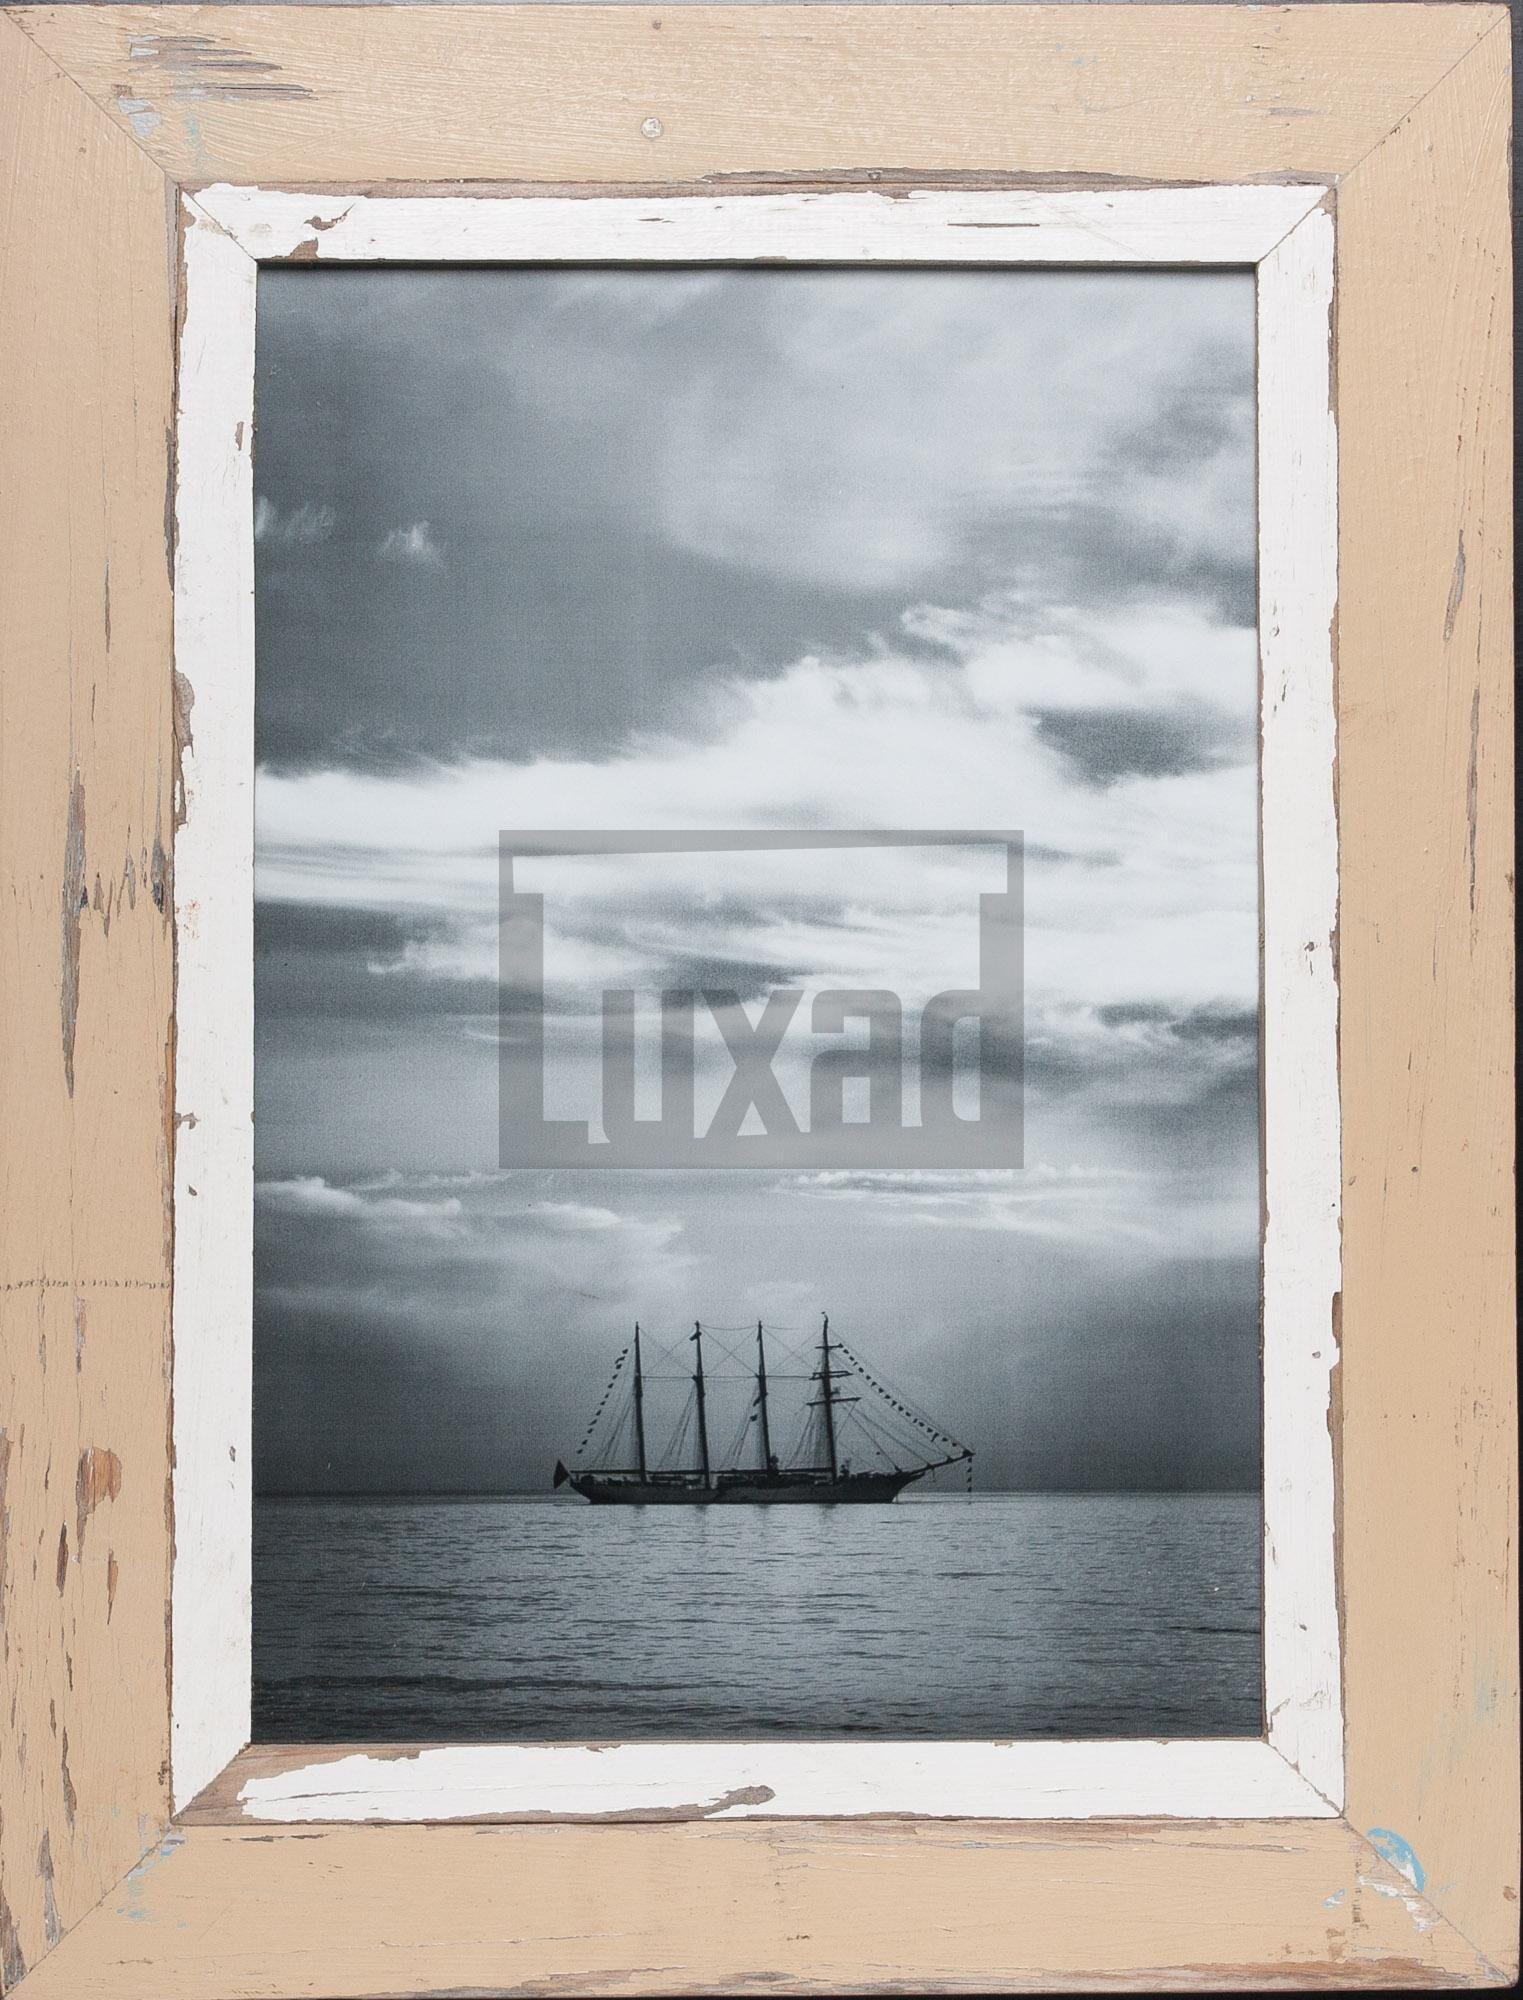 Wechselrahmen aus Altholz für Fotos DIN A3